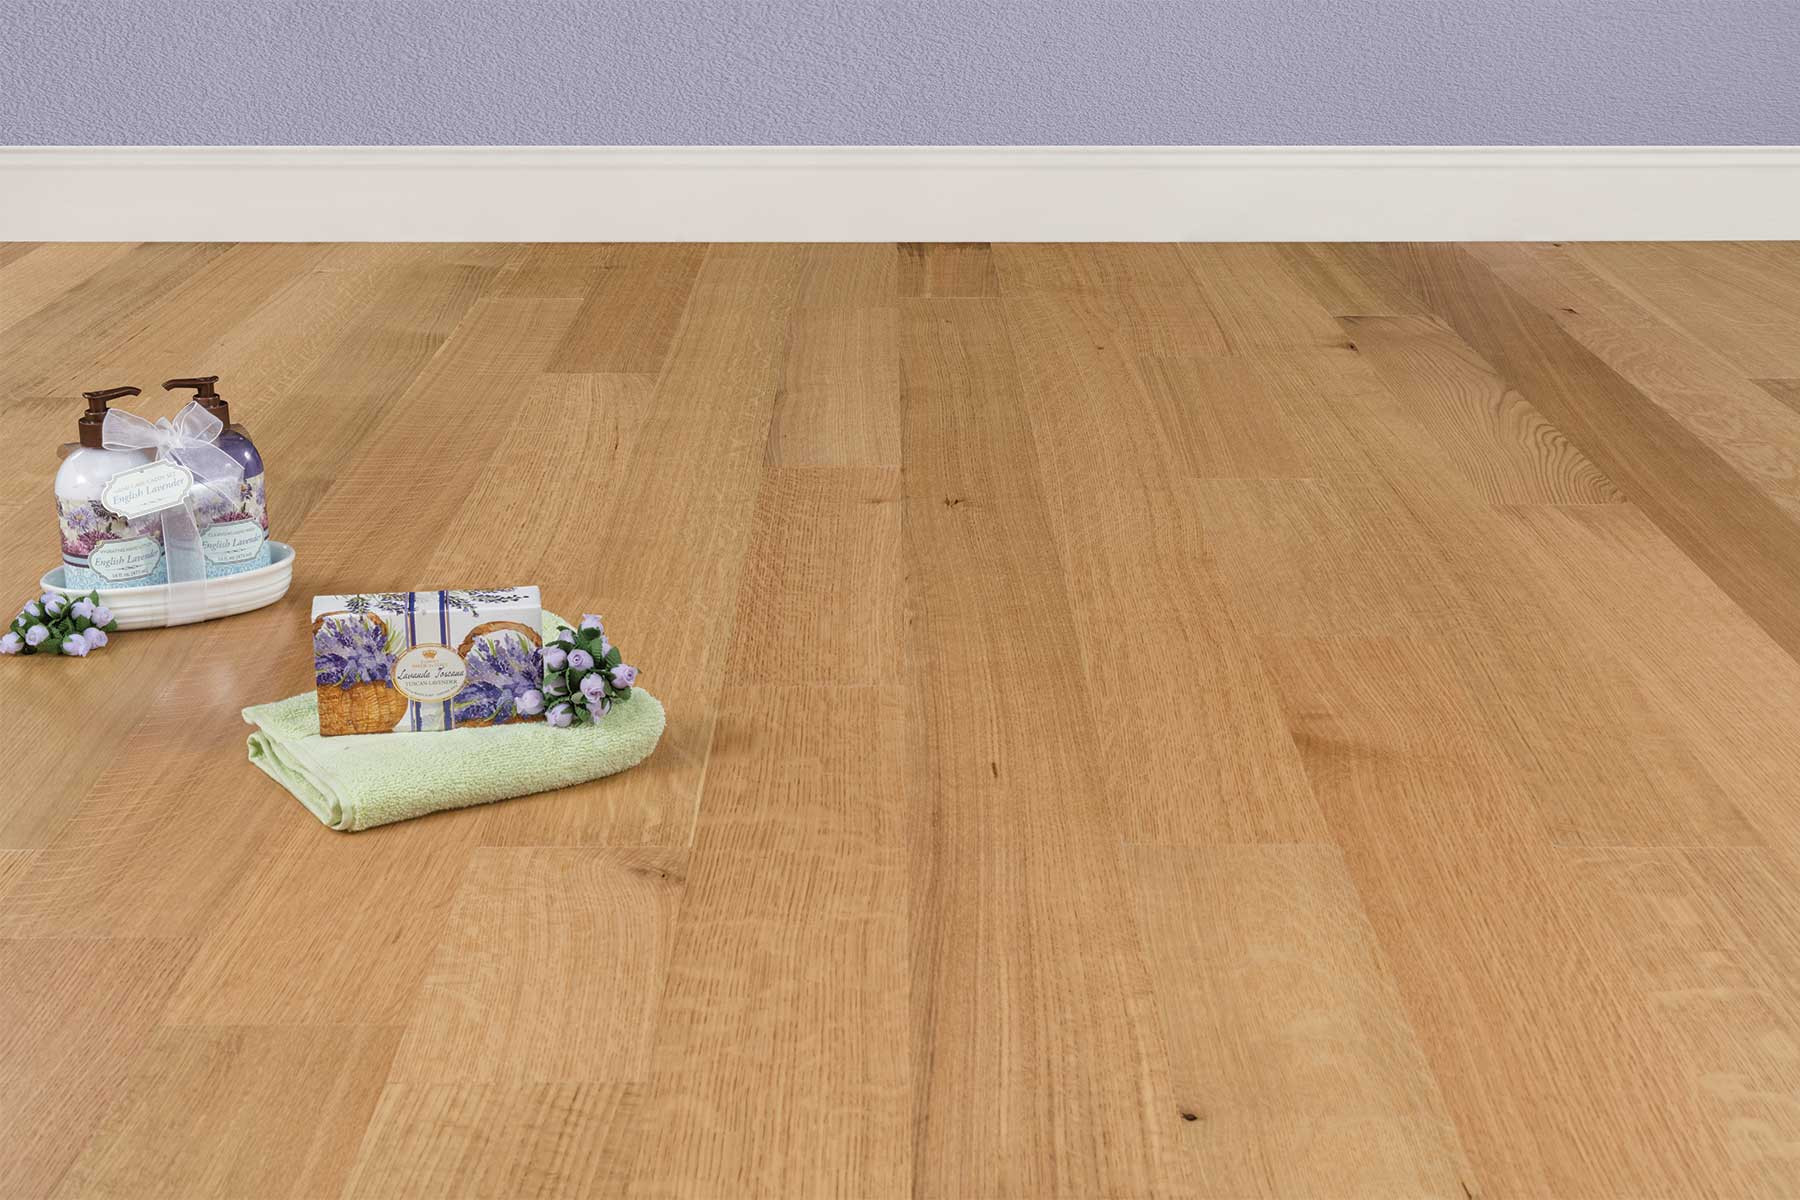 5 Inch White Oak Hardwood Flooring Of Wood Flooring Collections for American White Oak